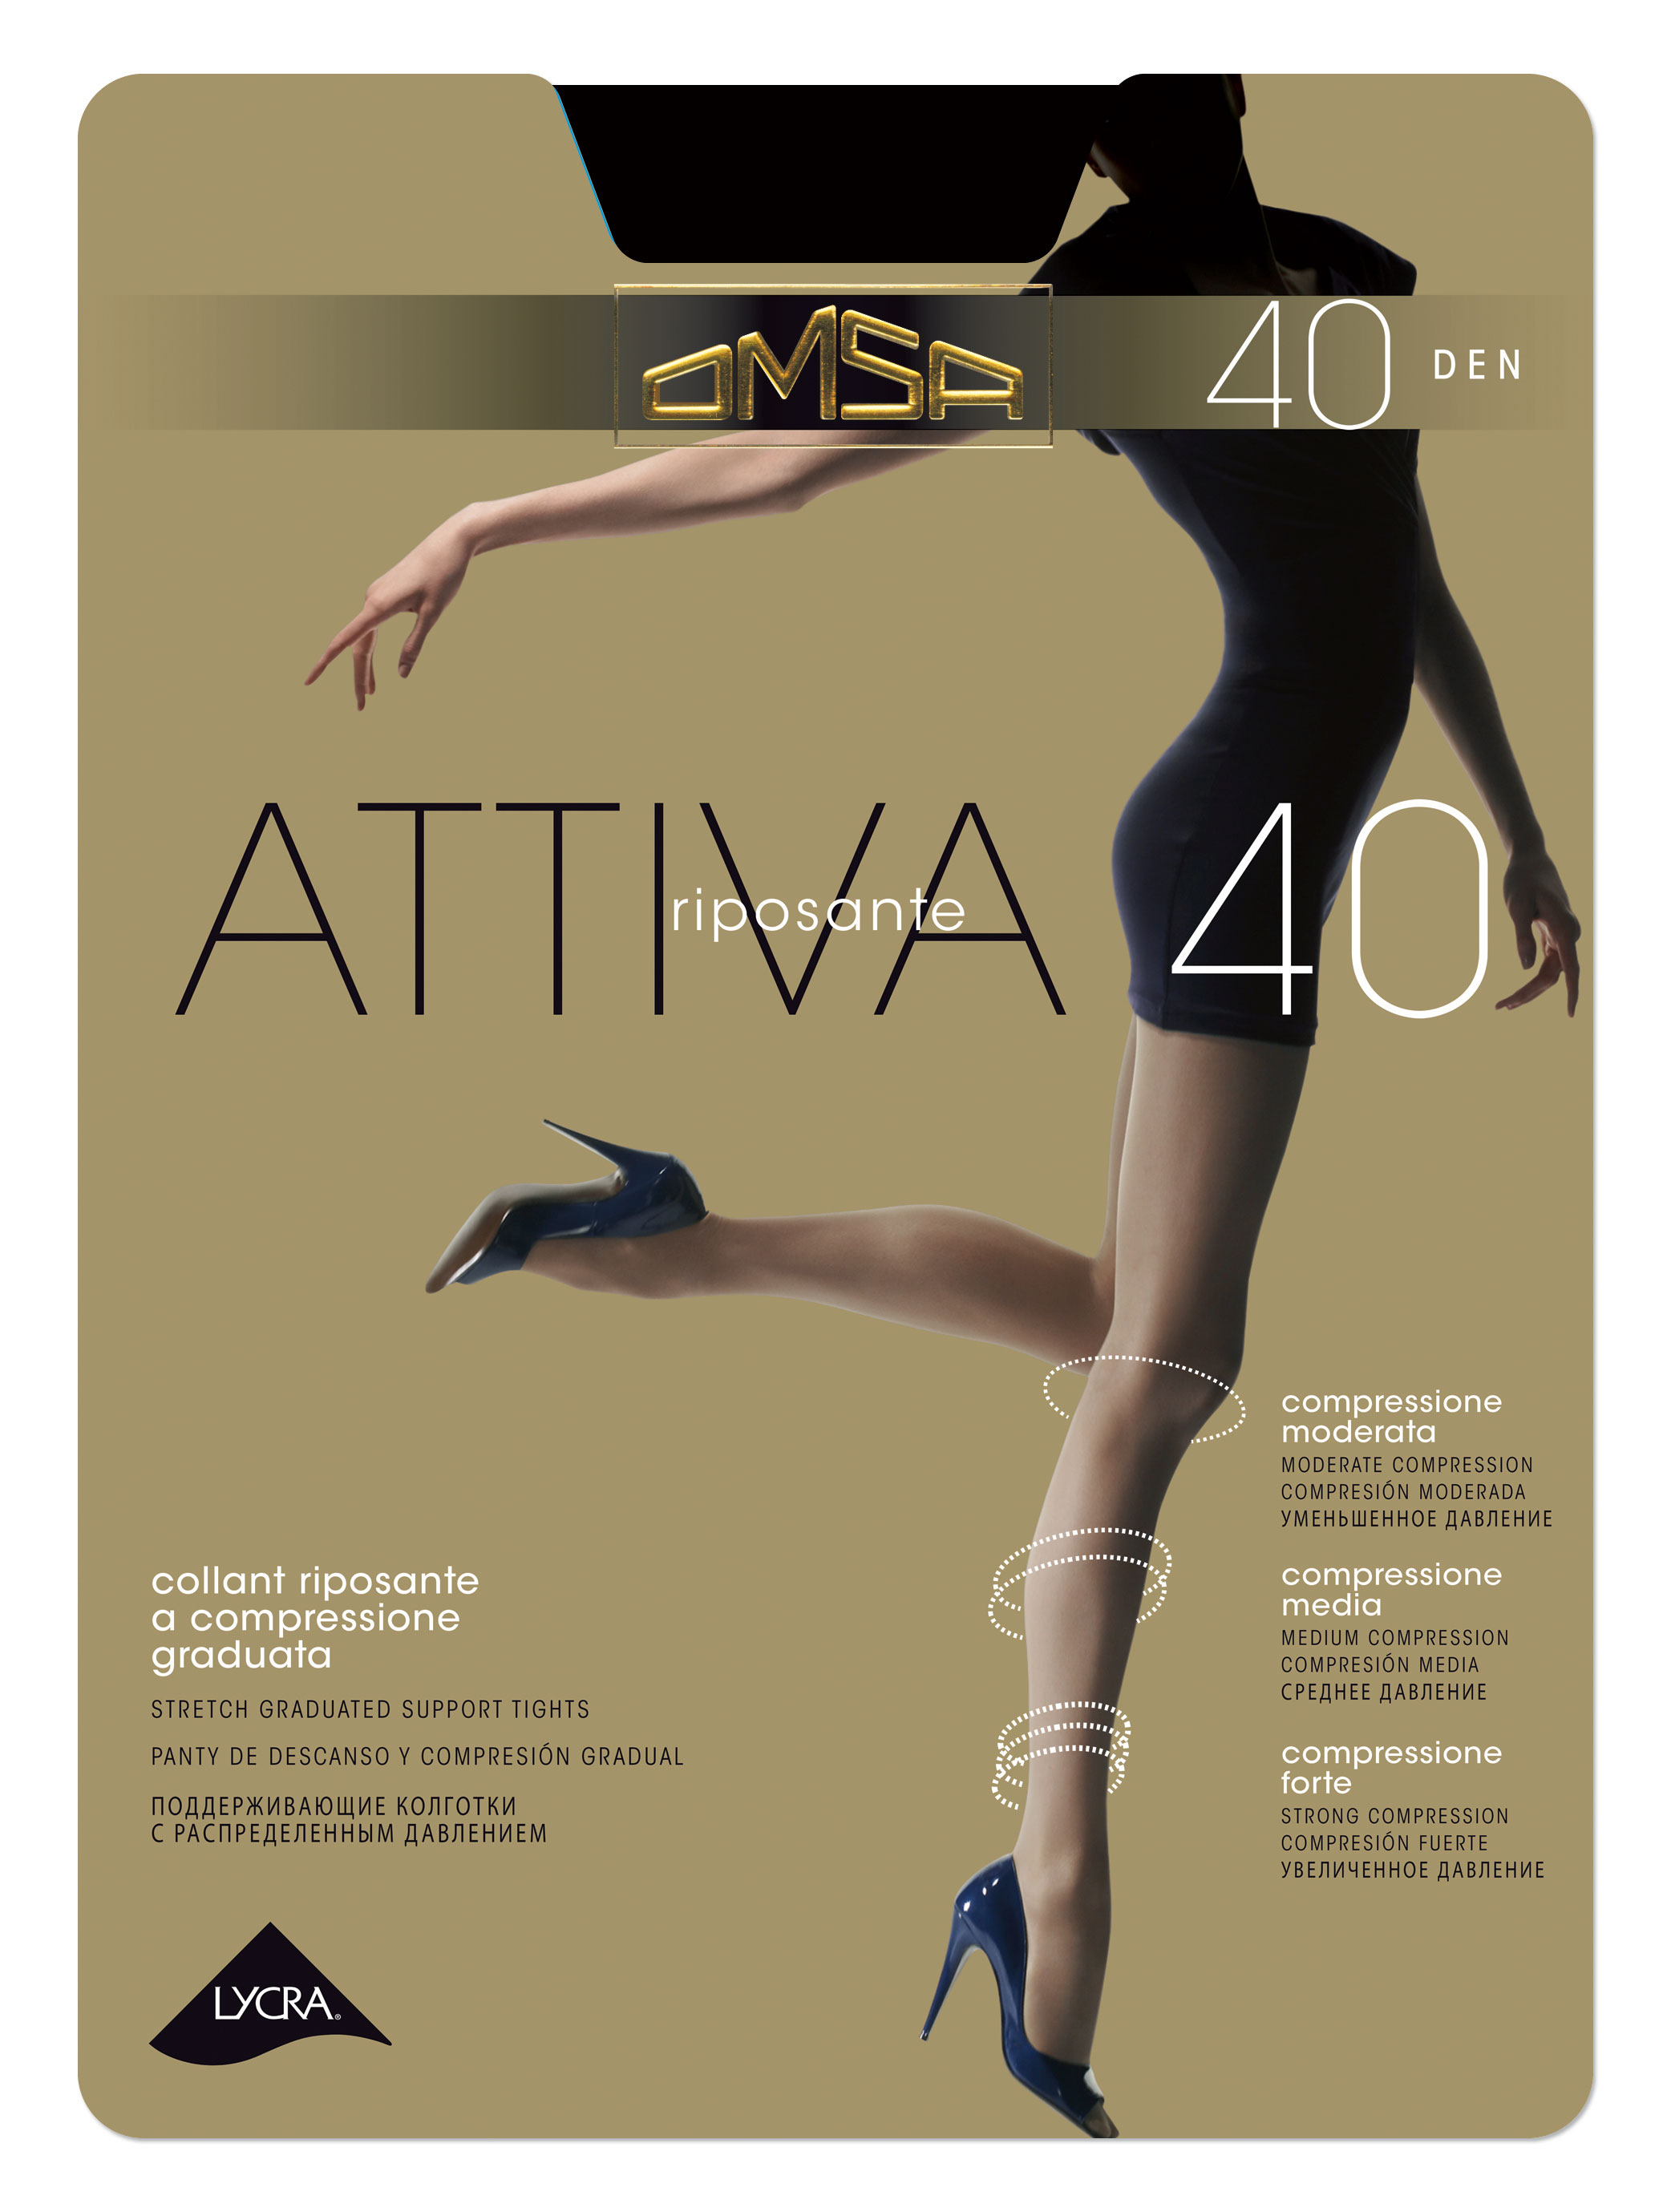 https://golden-legs.com.ua/images/stories/virtuemart/product/stock_product_image_5080_2889491581.jpg